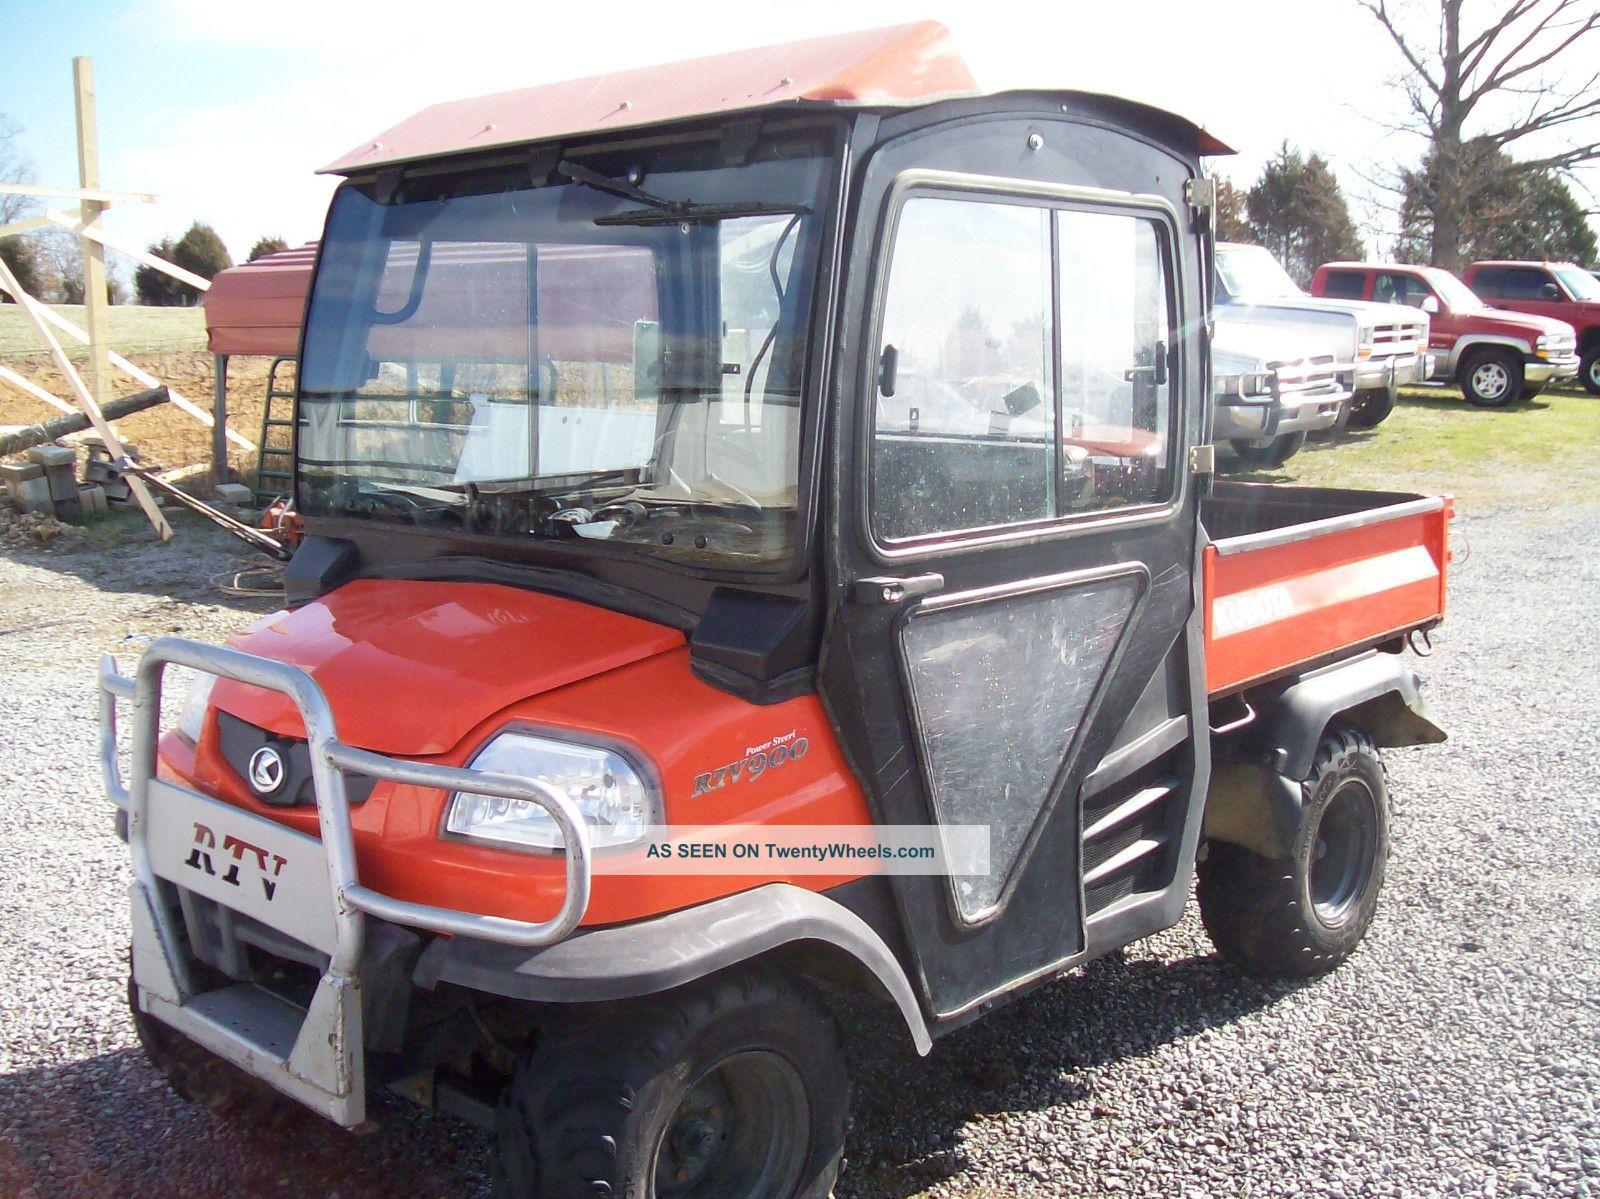 2005 Kubota Diesel Rtv 900 1399 Hrs 4x4 Hard Cab,  Heat Utility Vehicles photo